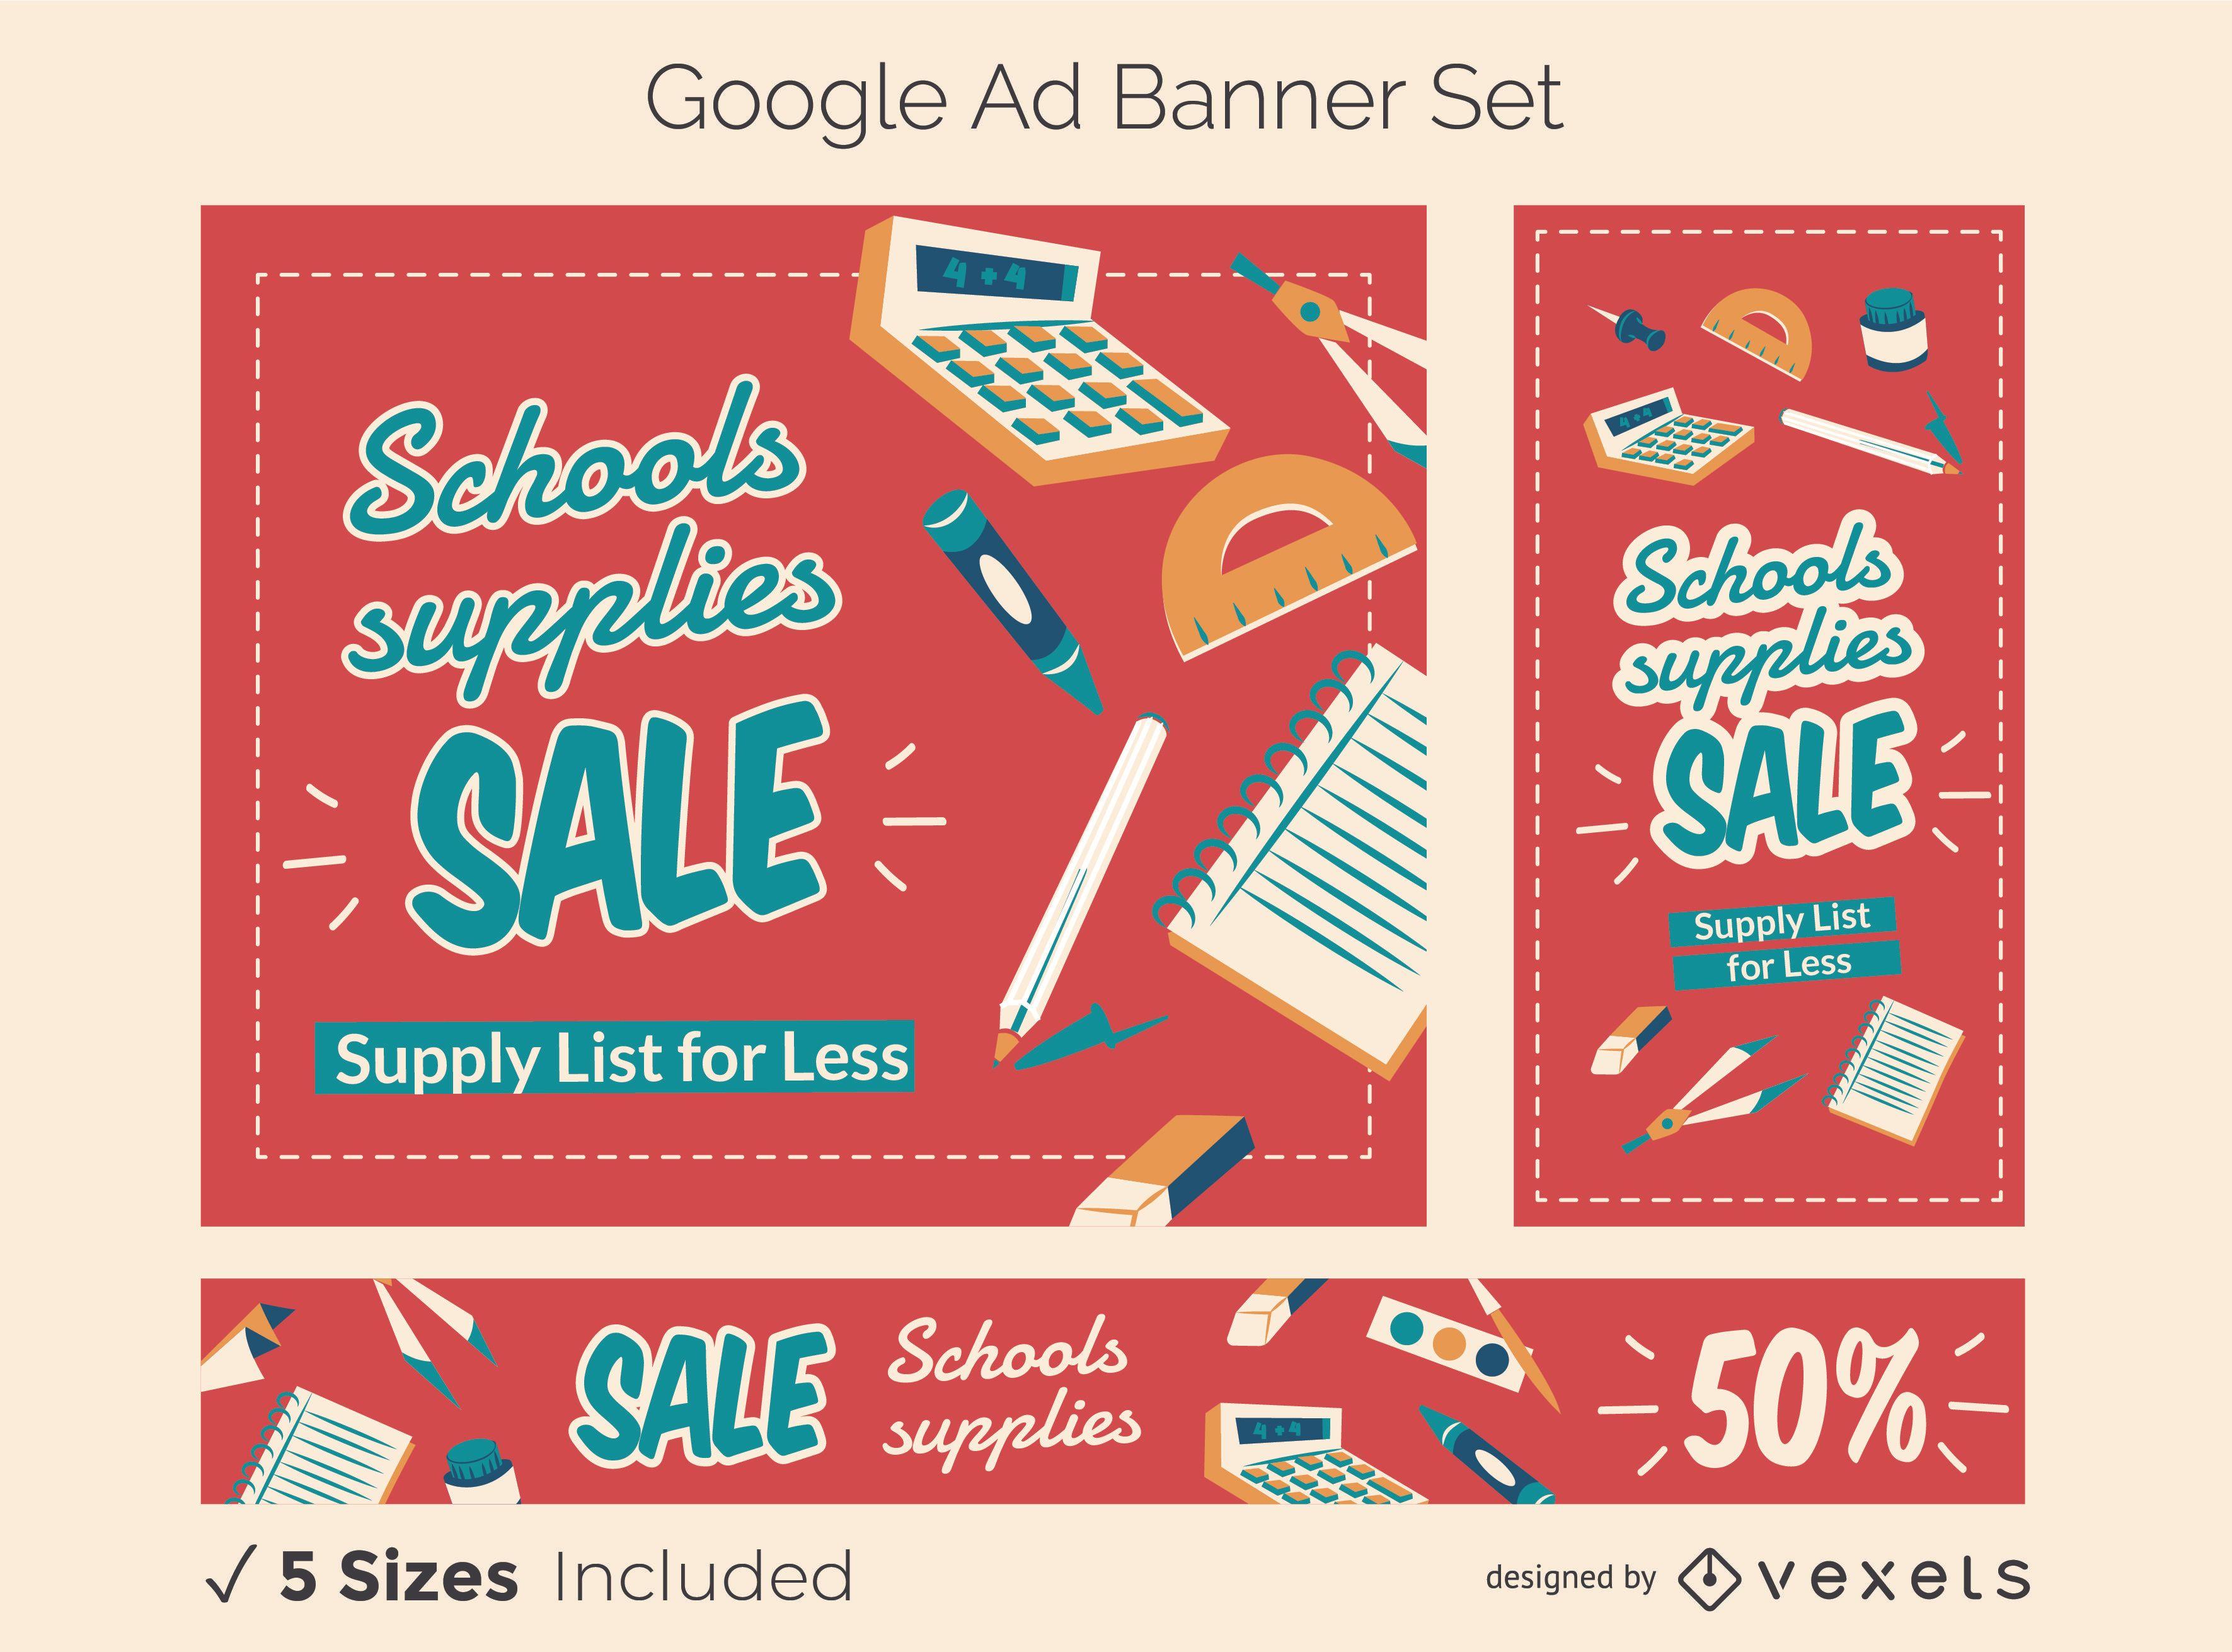 Conjunto de banners de anuncios de Google de promoción escolar